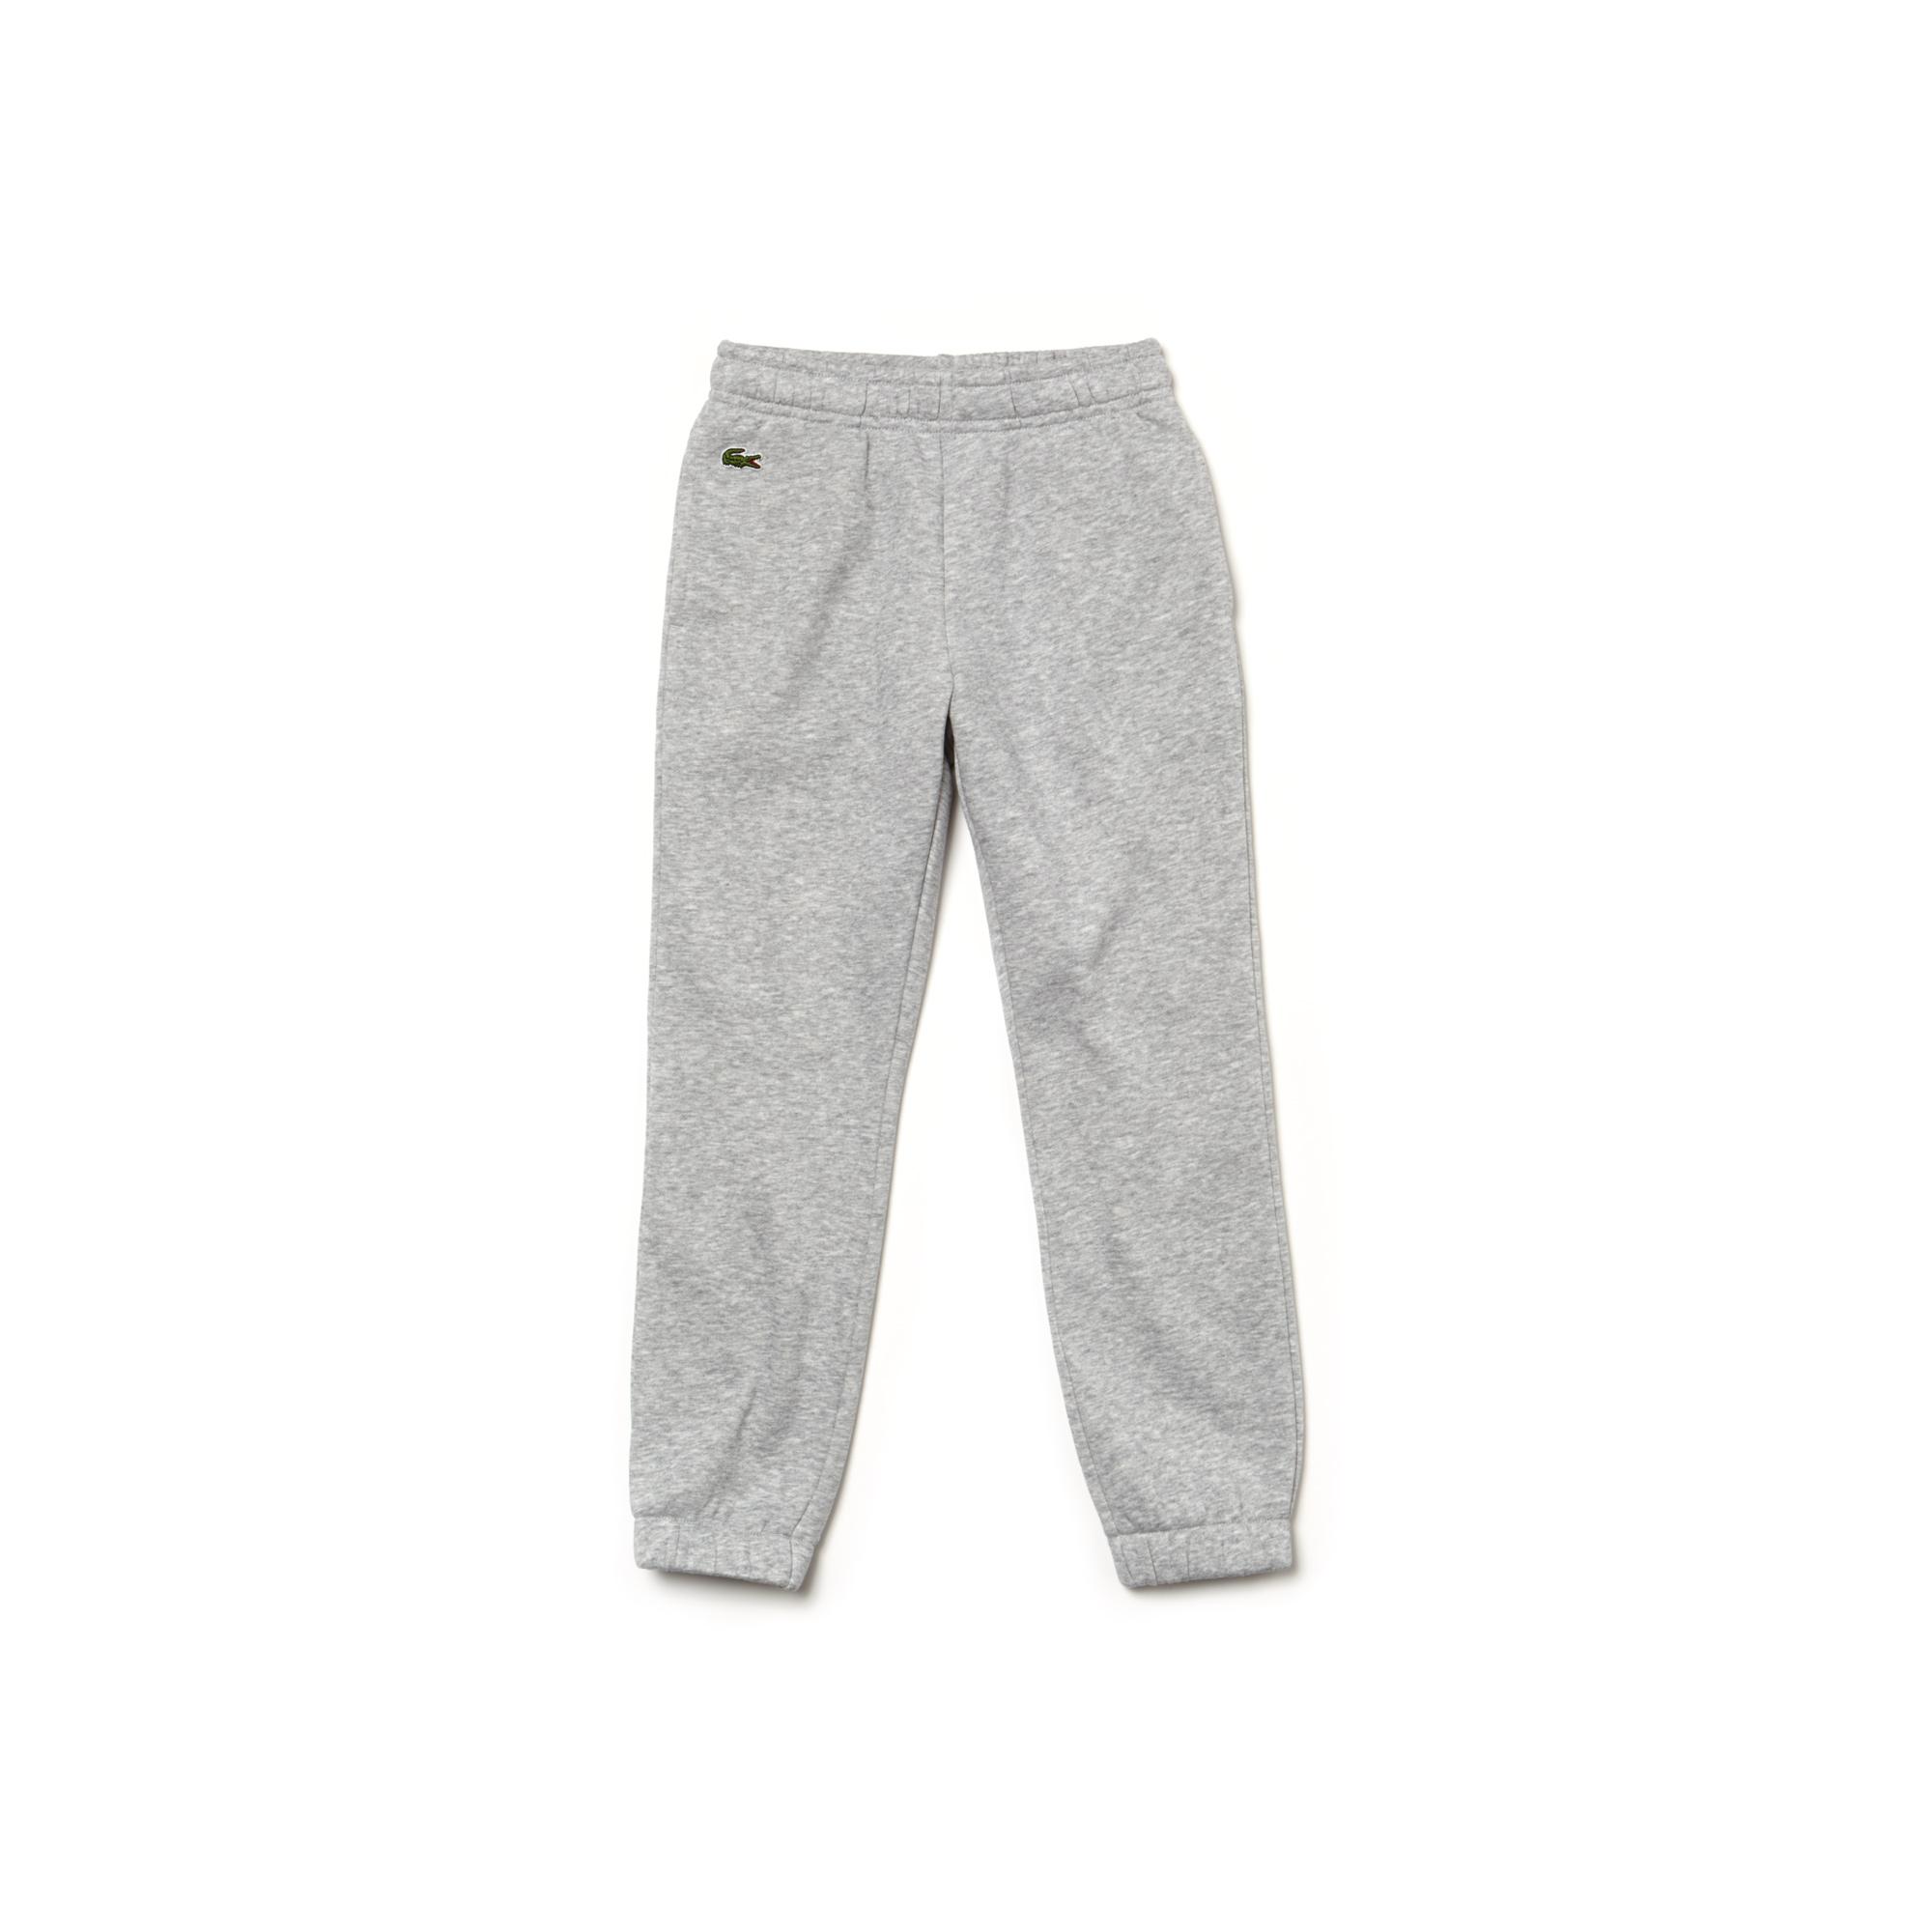 Lacoste Спортивные штаны Lacoste